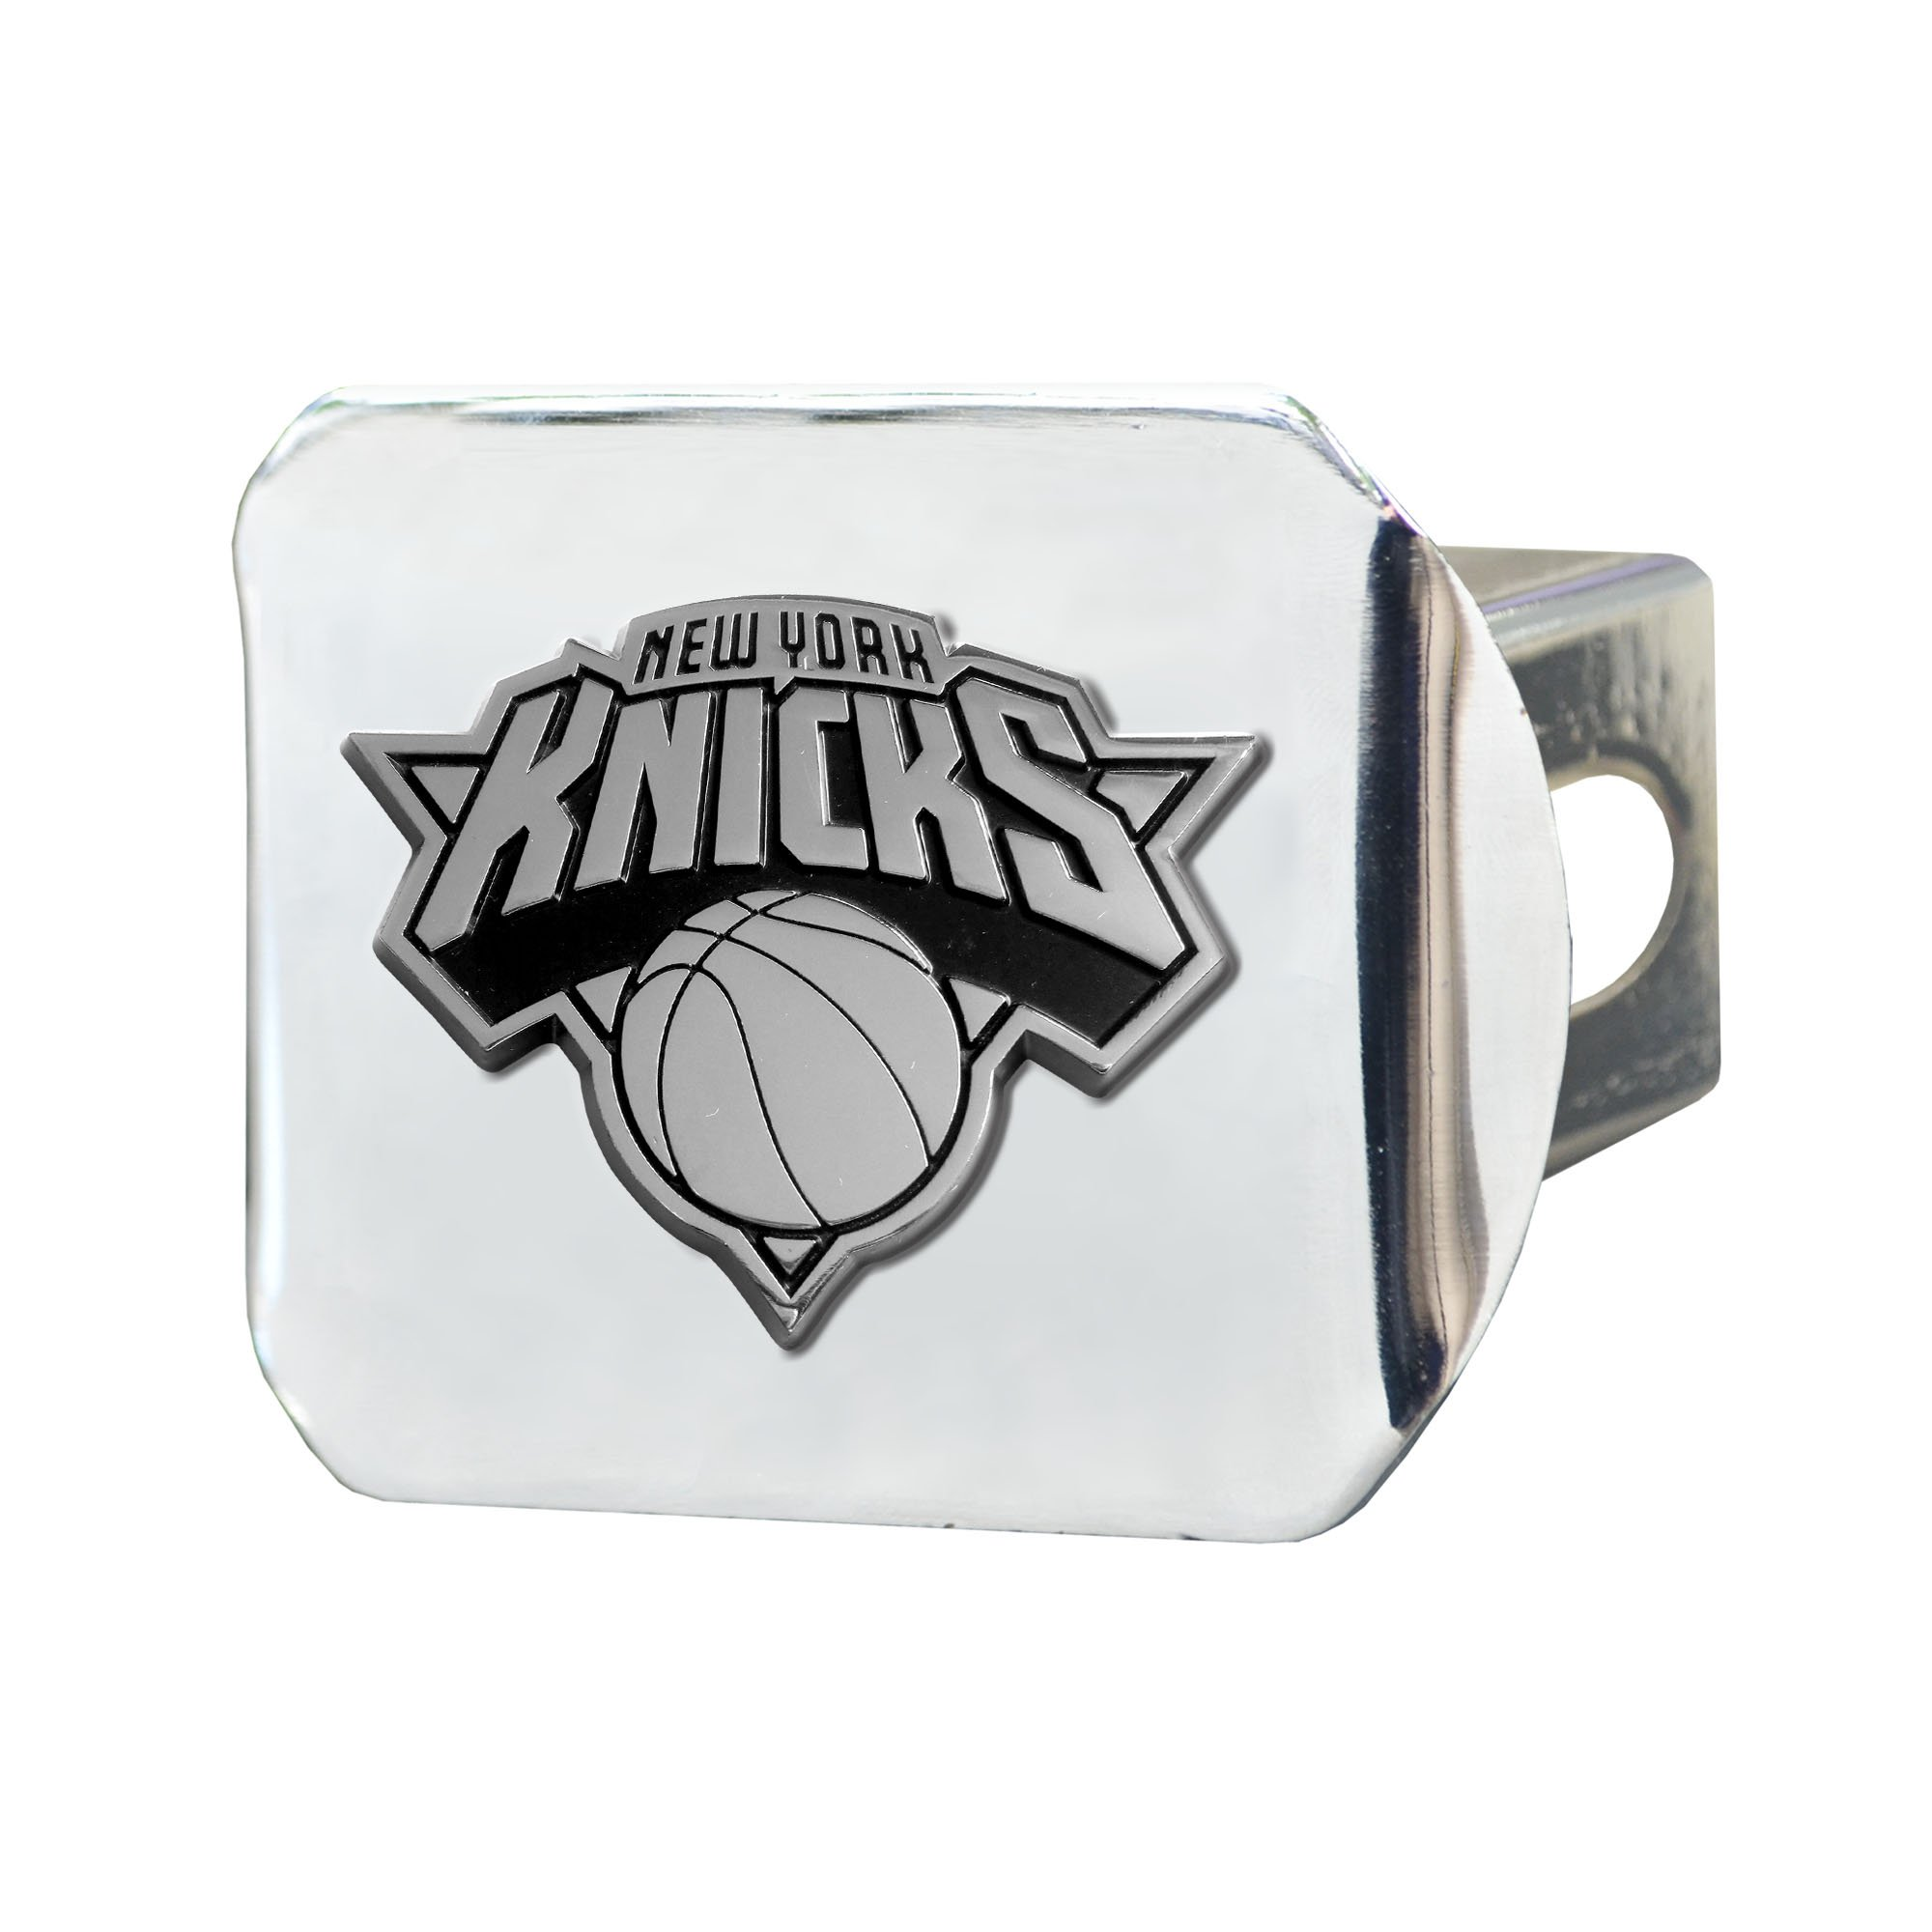 FANMATS NBA New York Knicks Chrome Hitch Cover by Fanmats